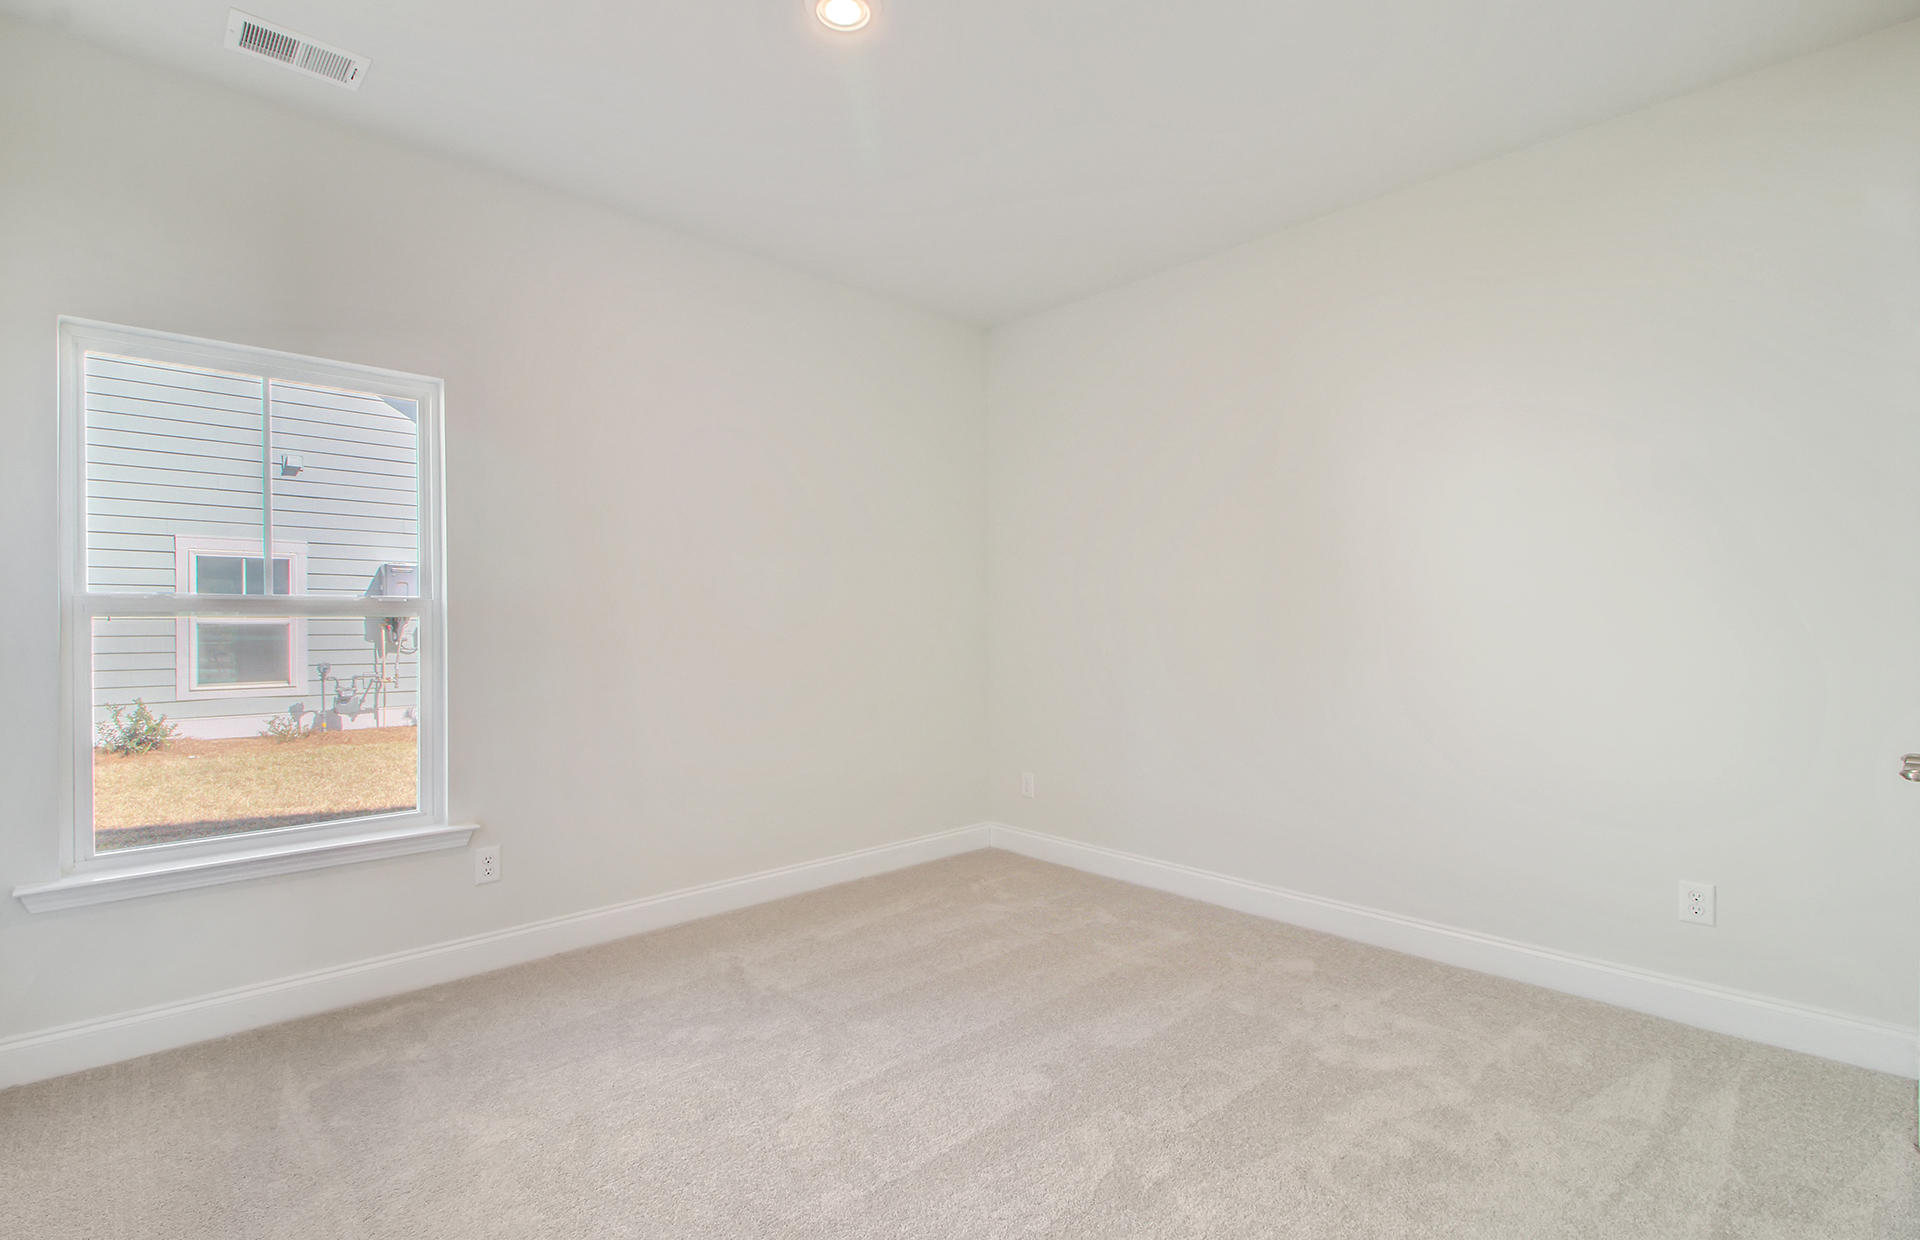 Park West Homes For Sale - 3062 Rice Field, Mount Pleasant, SC - 9